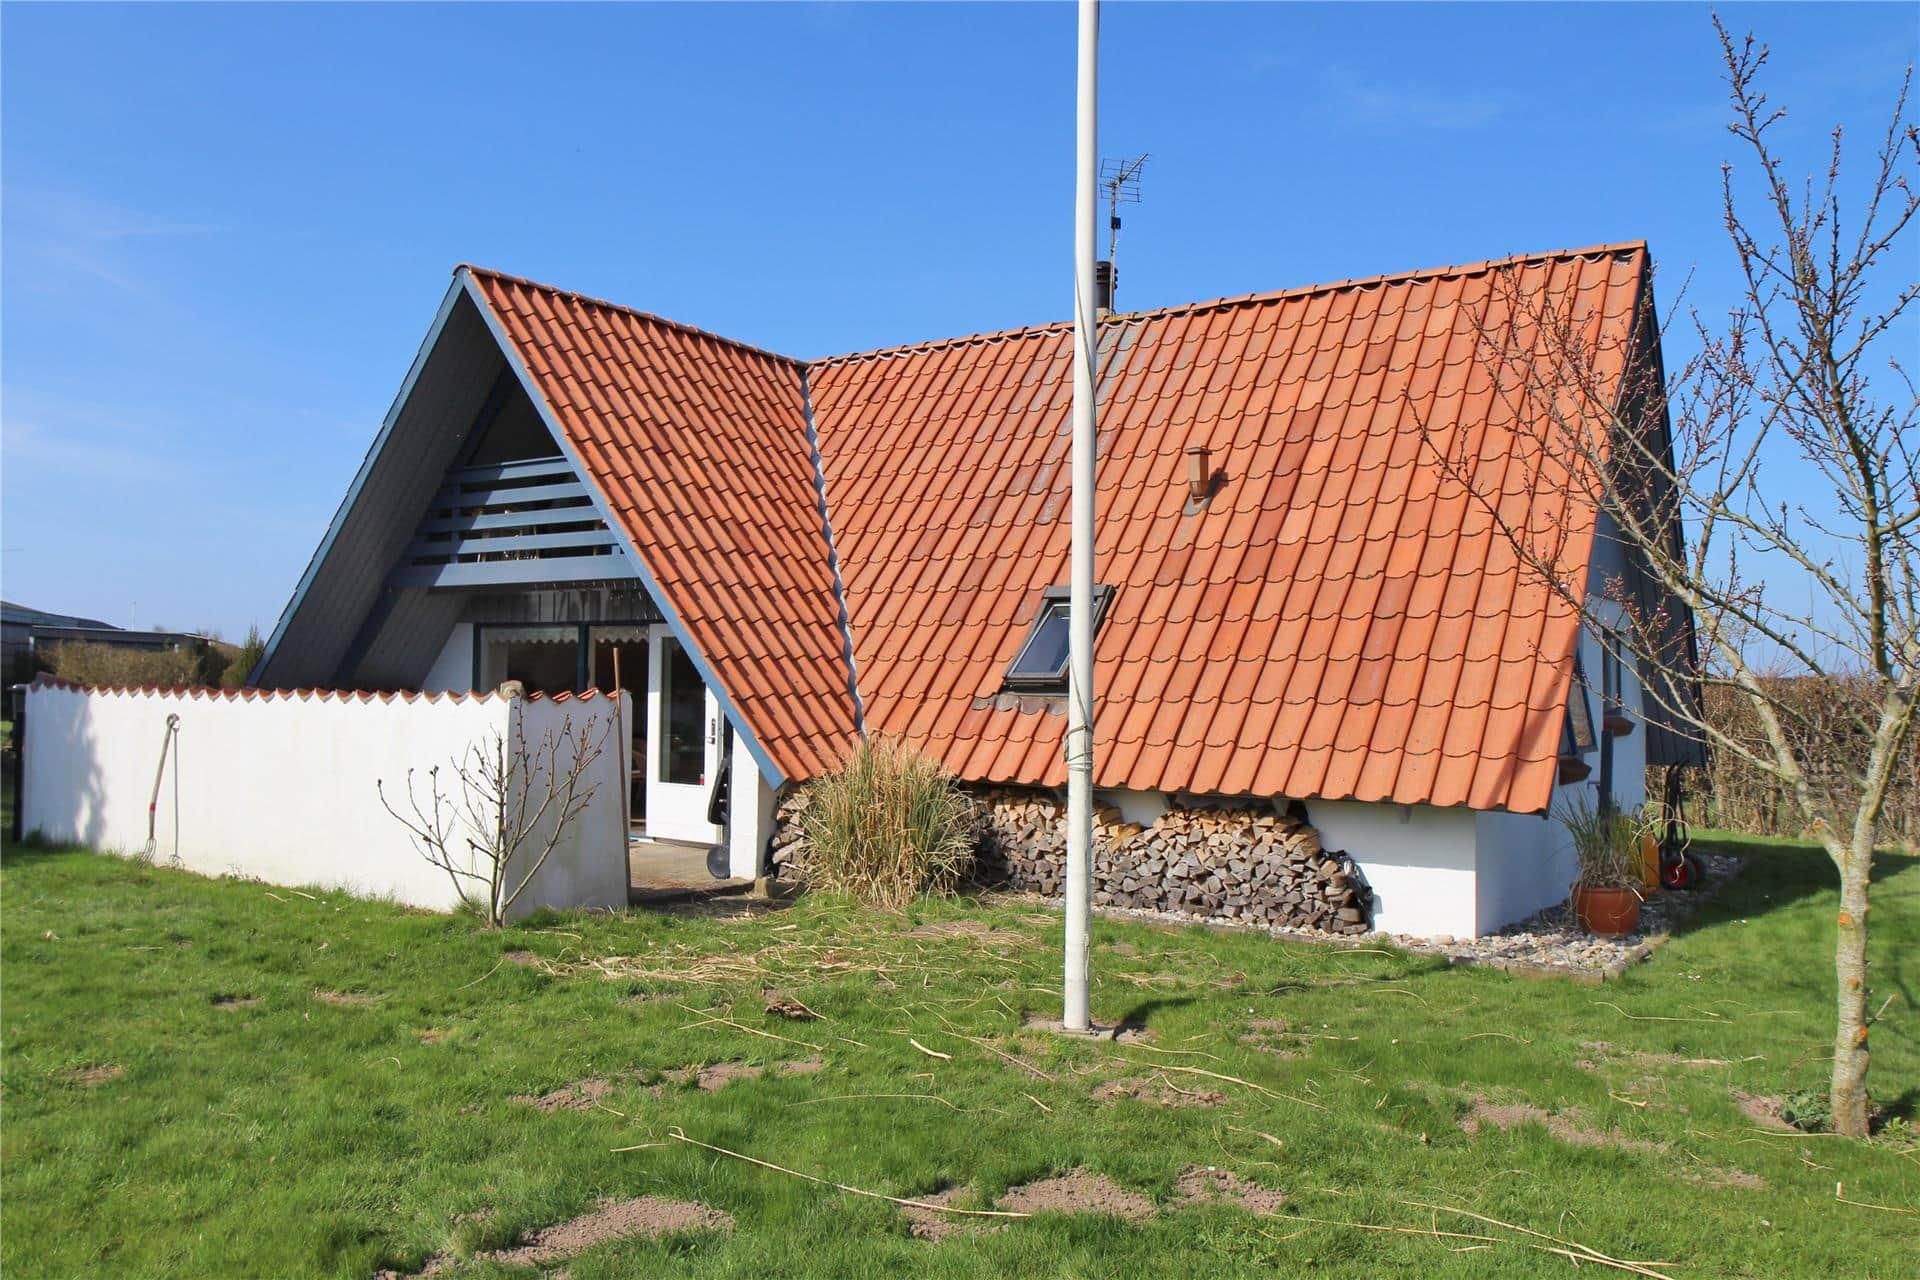 Afbeelding 1-3 Vakantiehuis M64137, Strandvænget 28, DK - 5400 Bogense